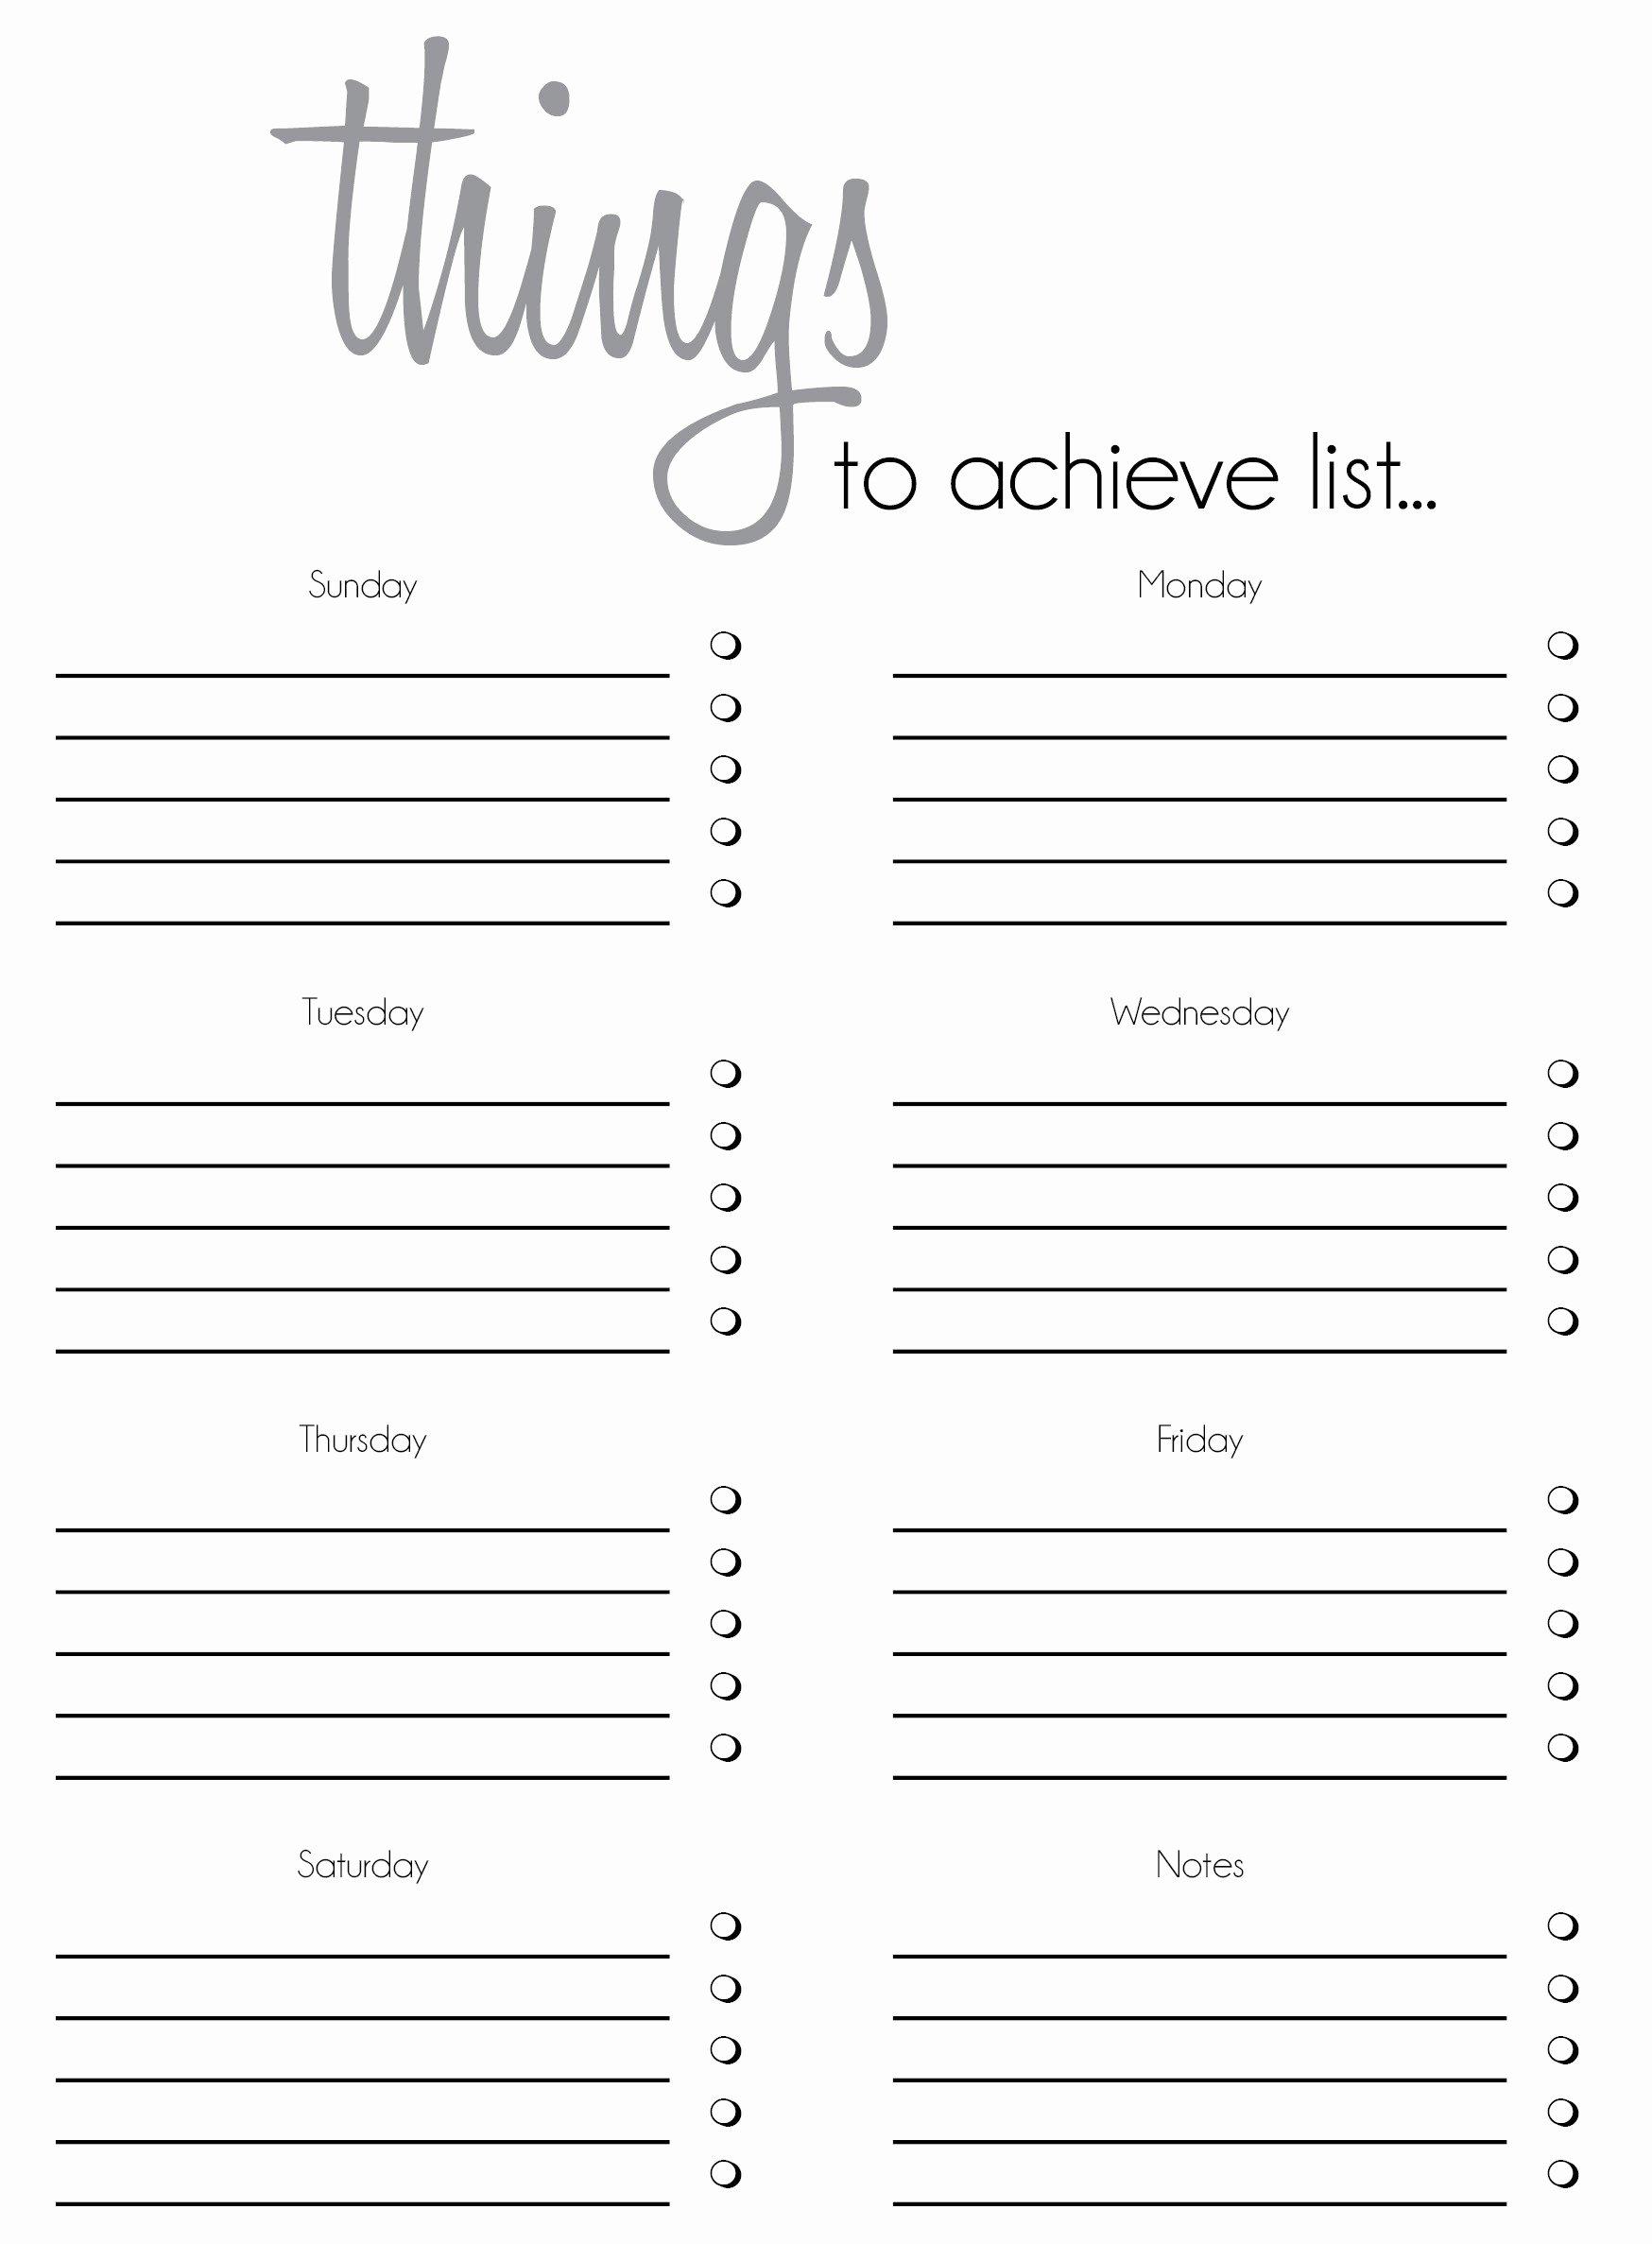 Task List Template Word Inspirational Free Printable to Do List Templates